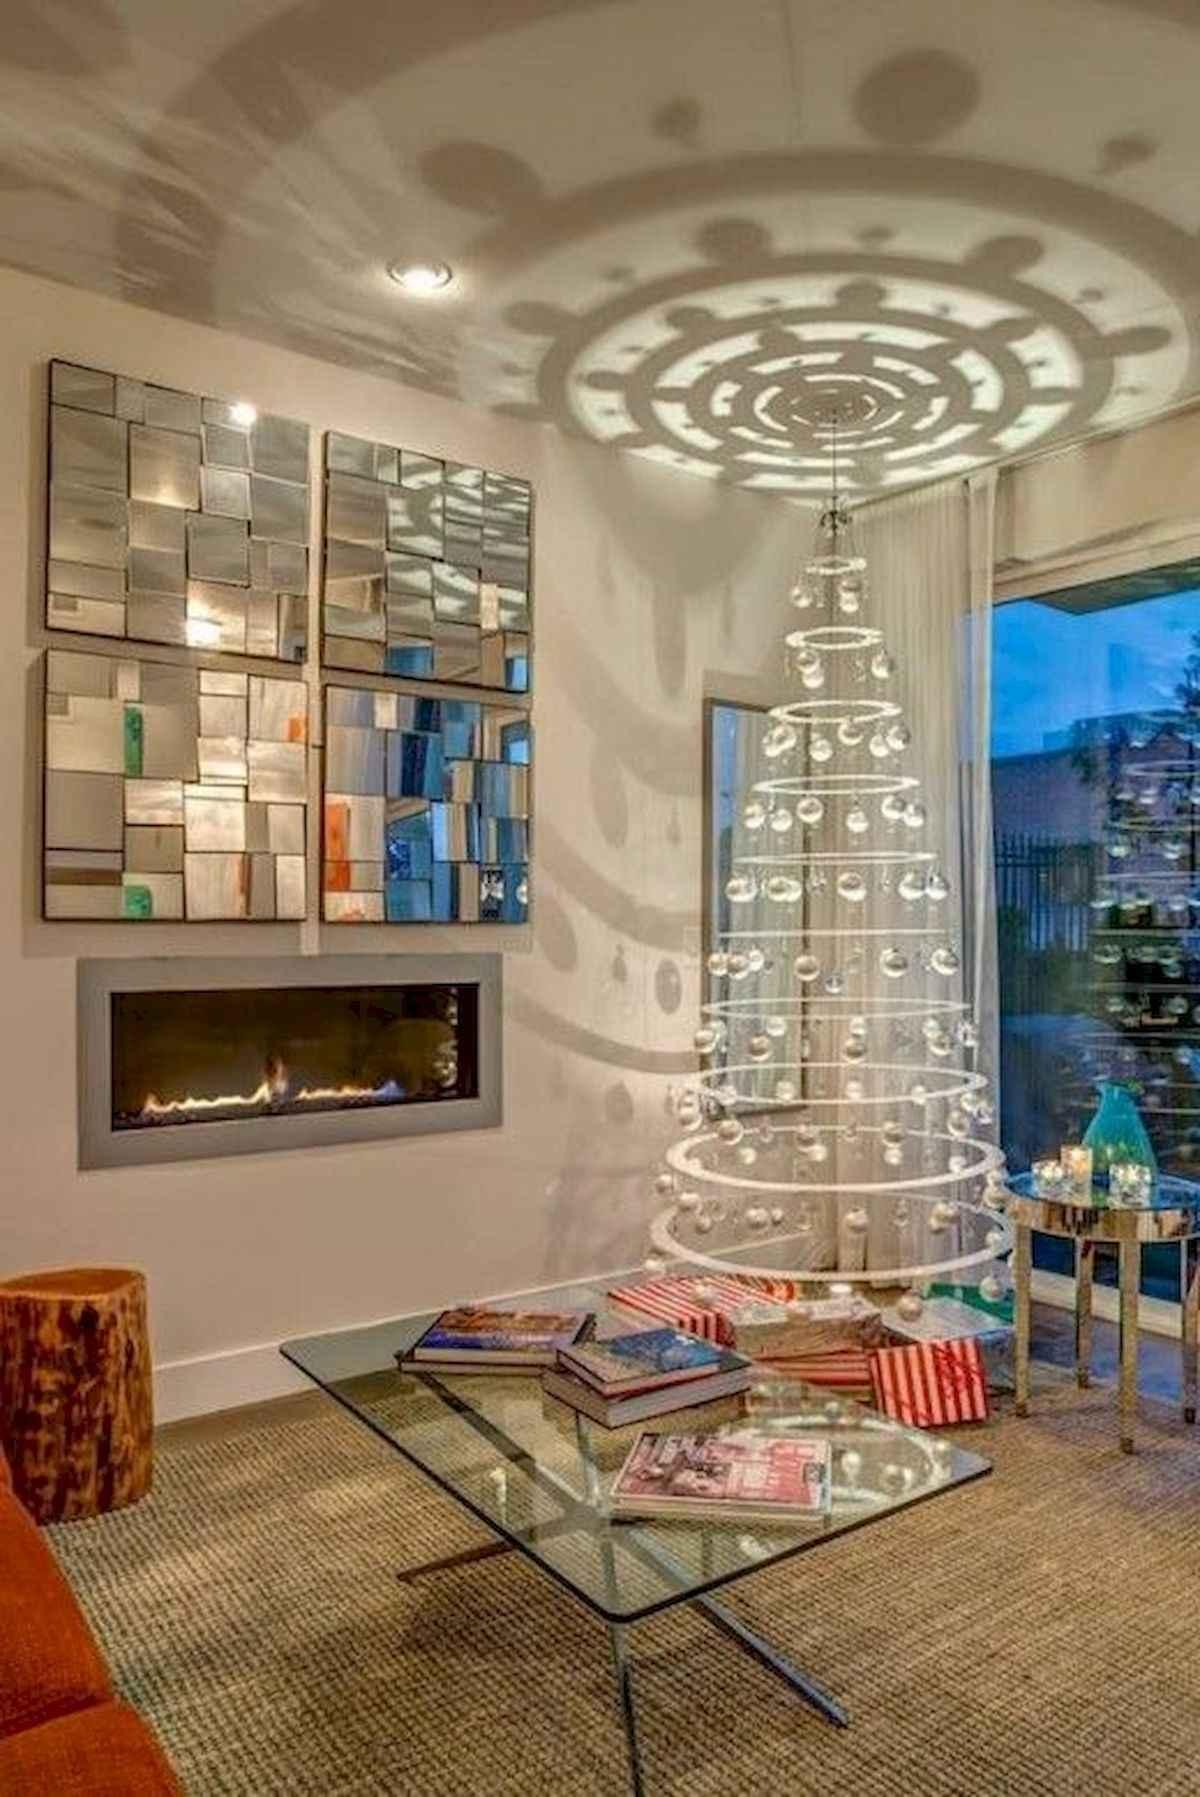 40 unique christmas tree ideas decorations (2)